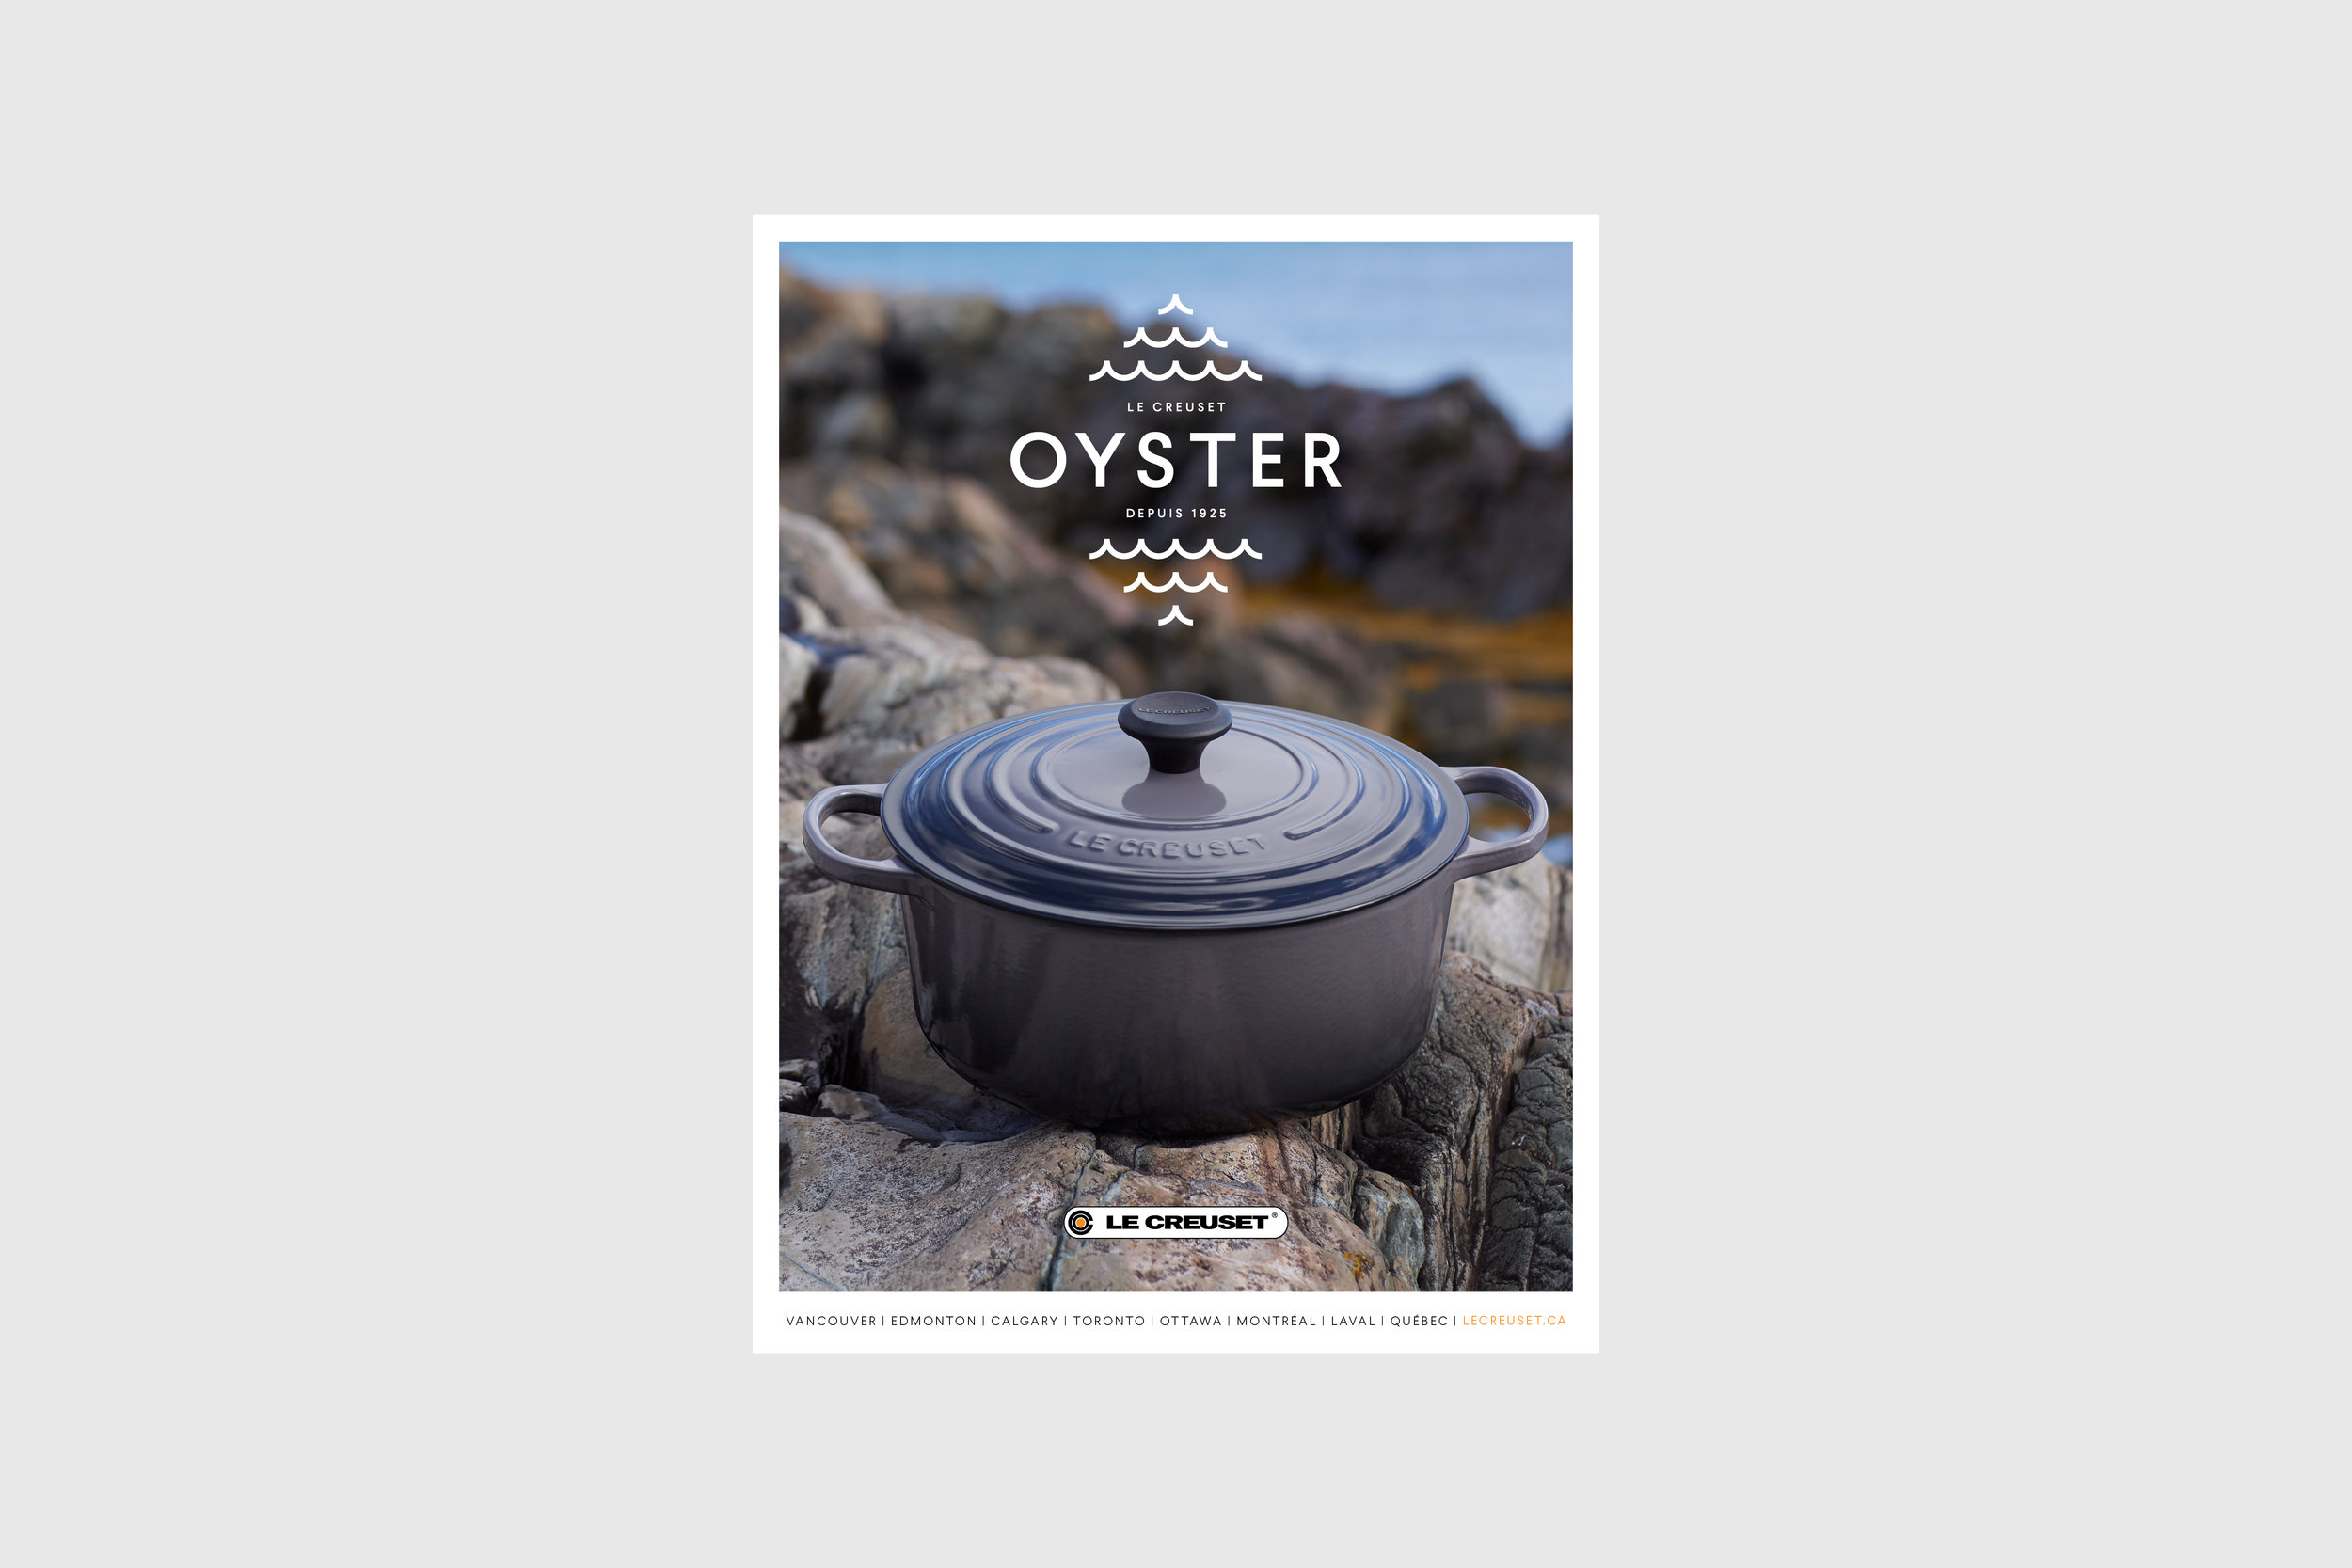 Oyster_02.jpg